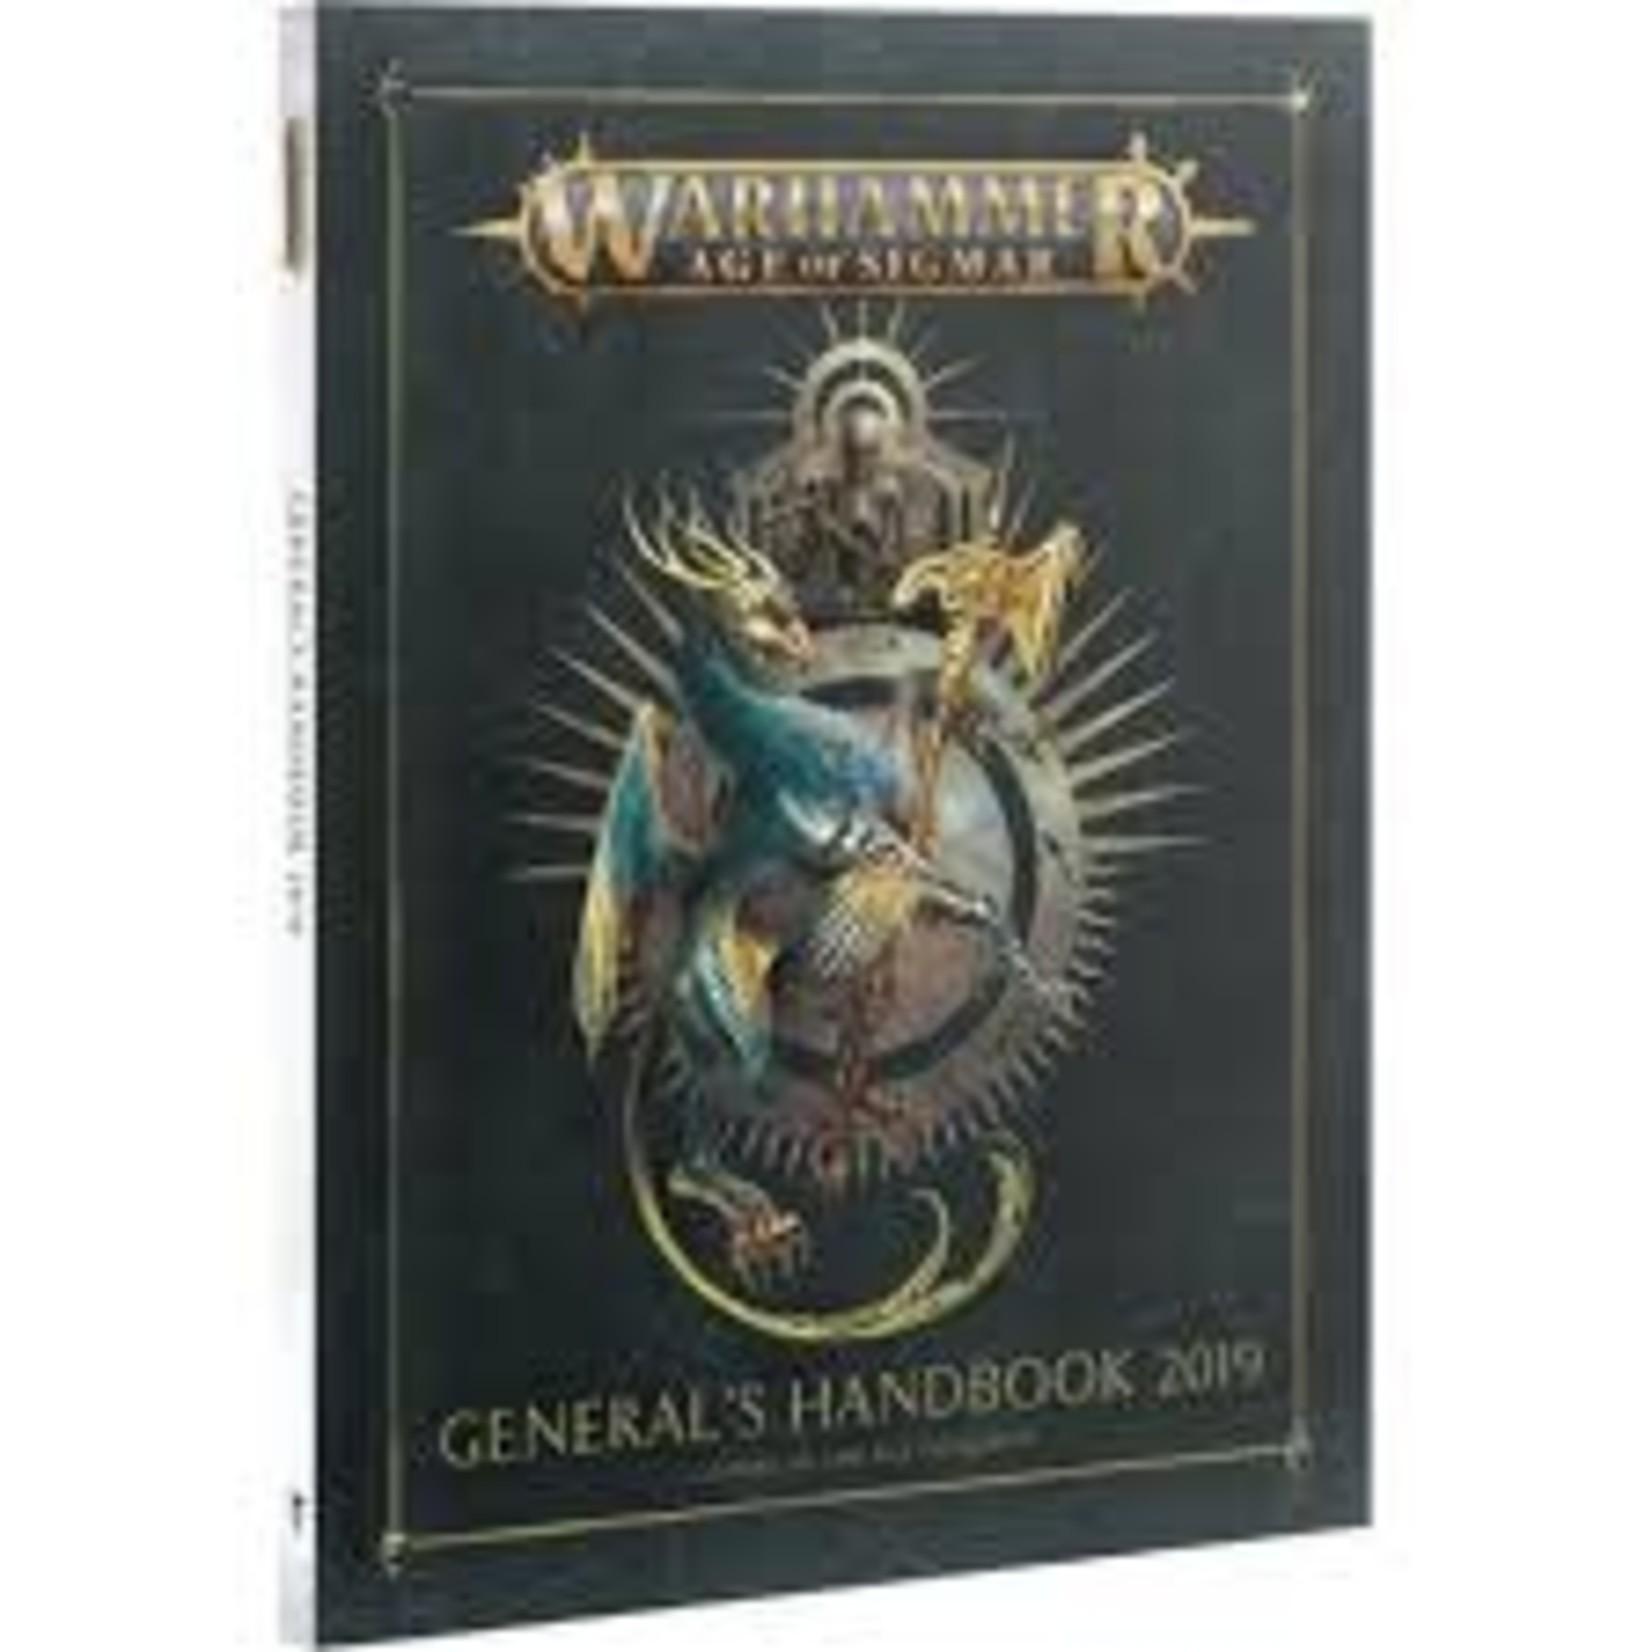 Games Workshop Warhammer Age of Sigmar: General's Handbook 2019